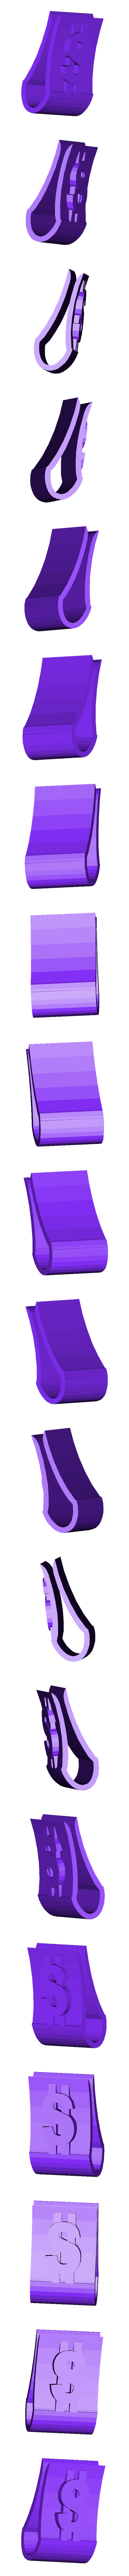 money_clip-2.stl Download free STL file Money Clip • Model to 3D print, Ollie